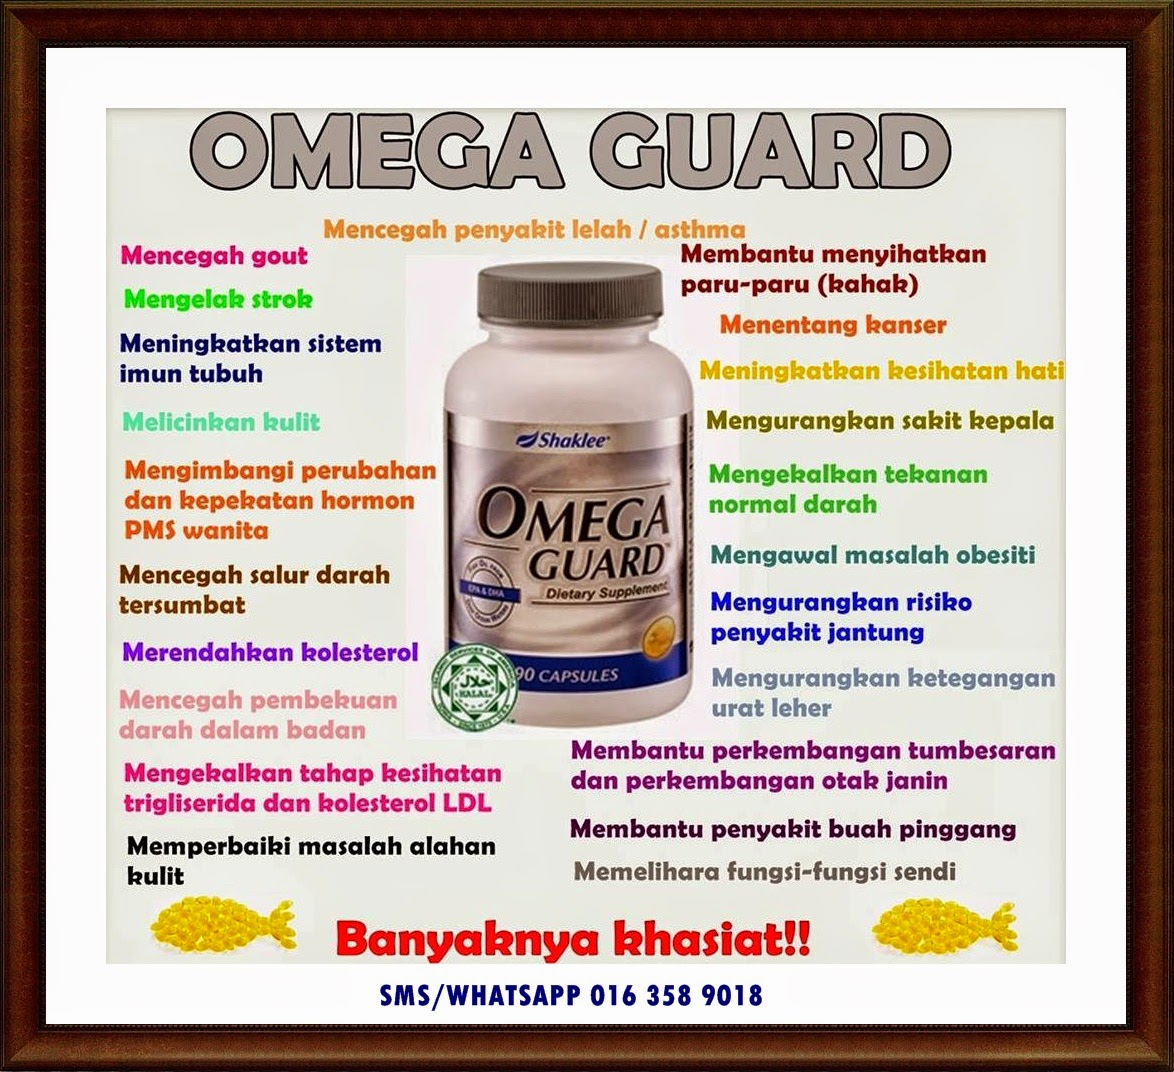 manfaat omega